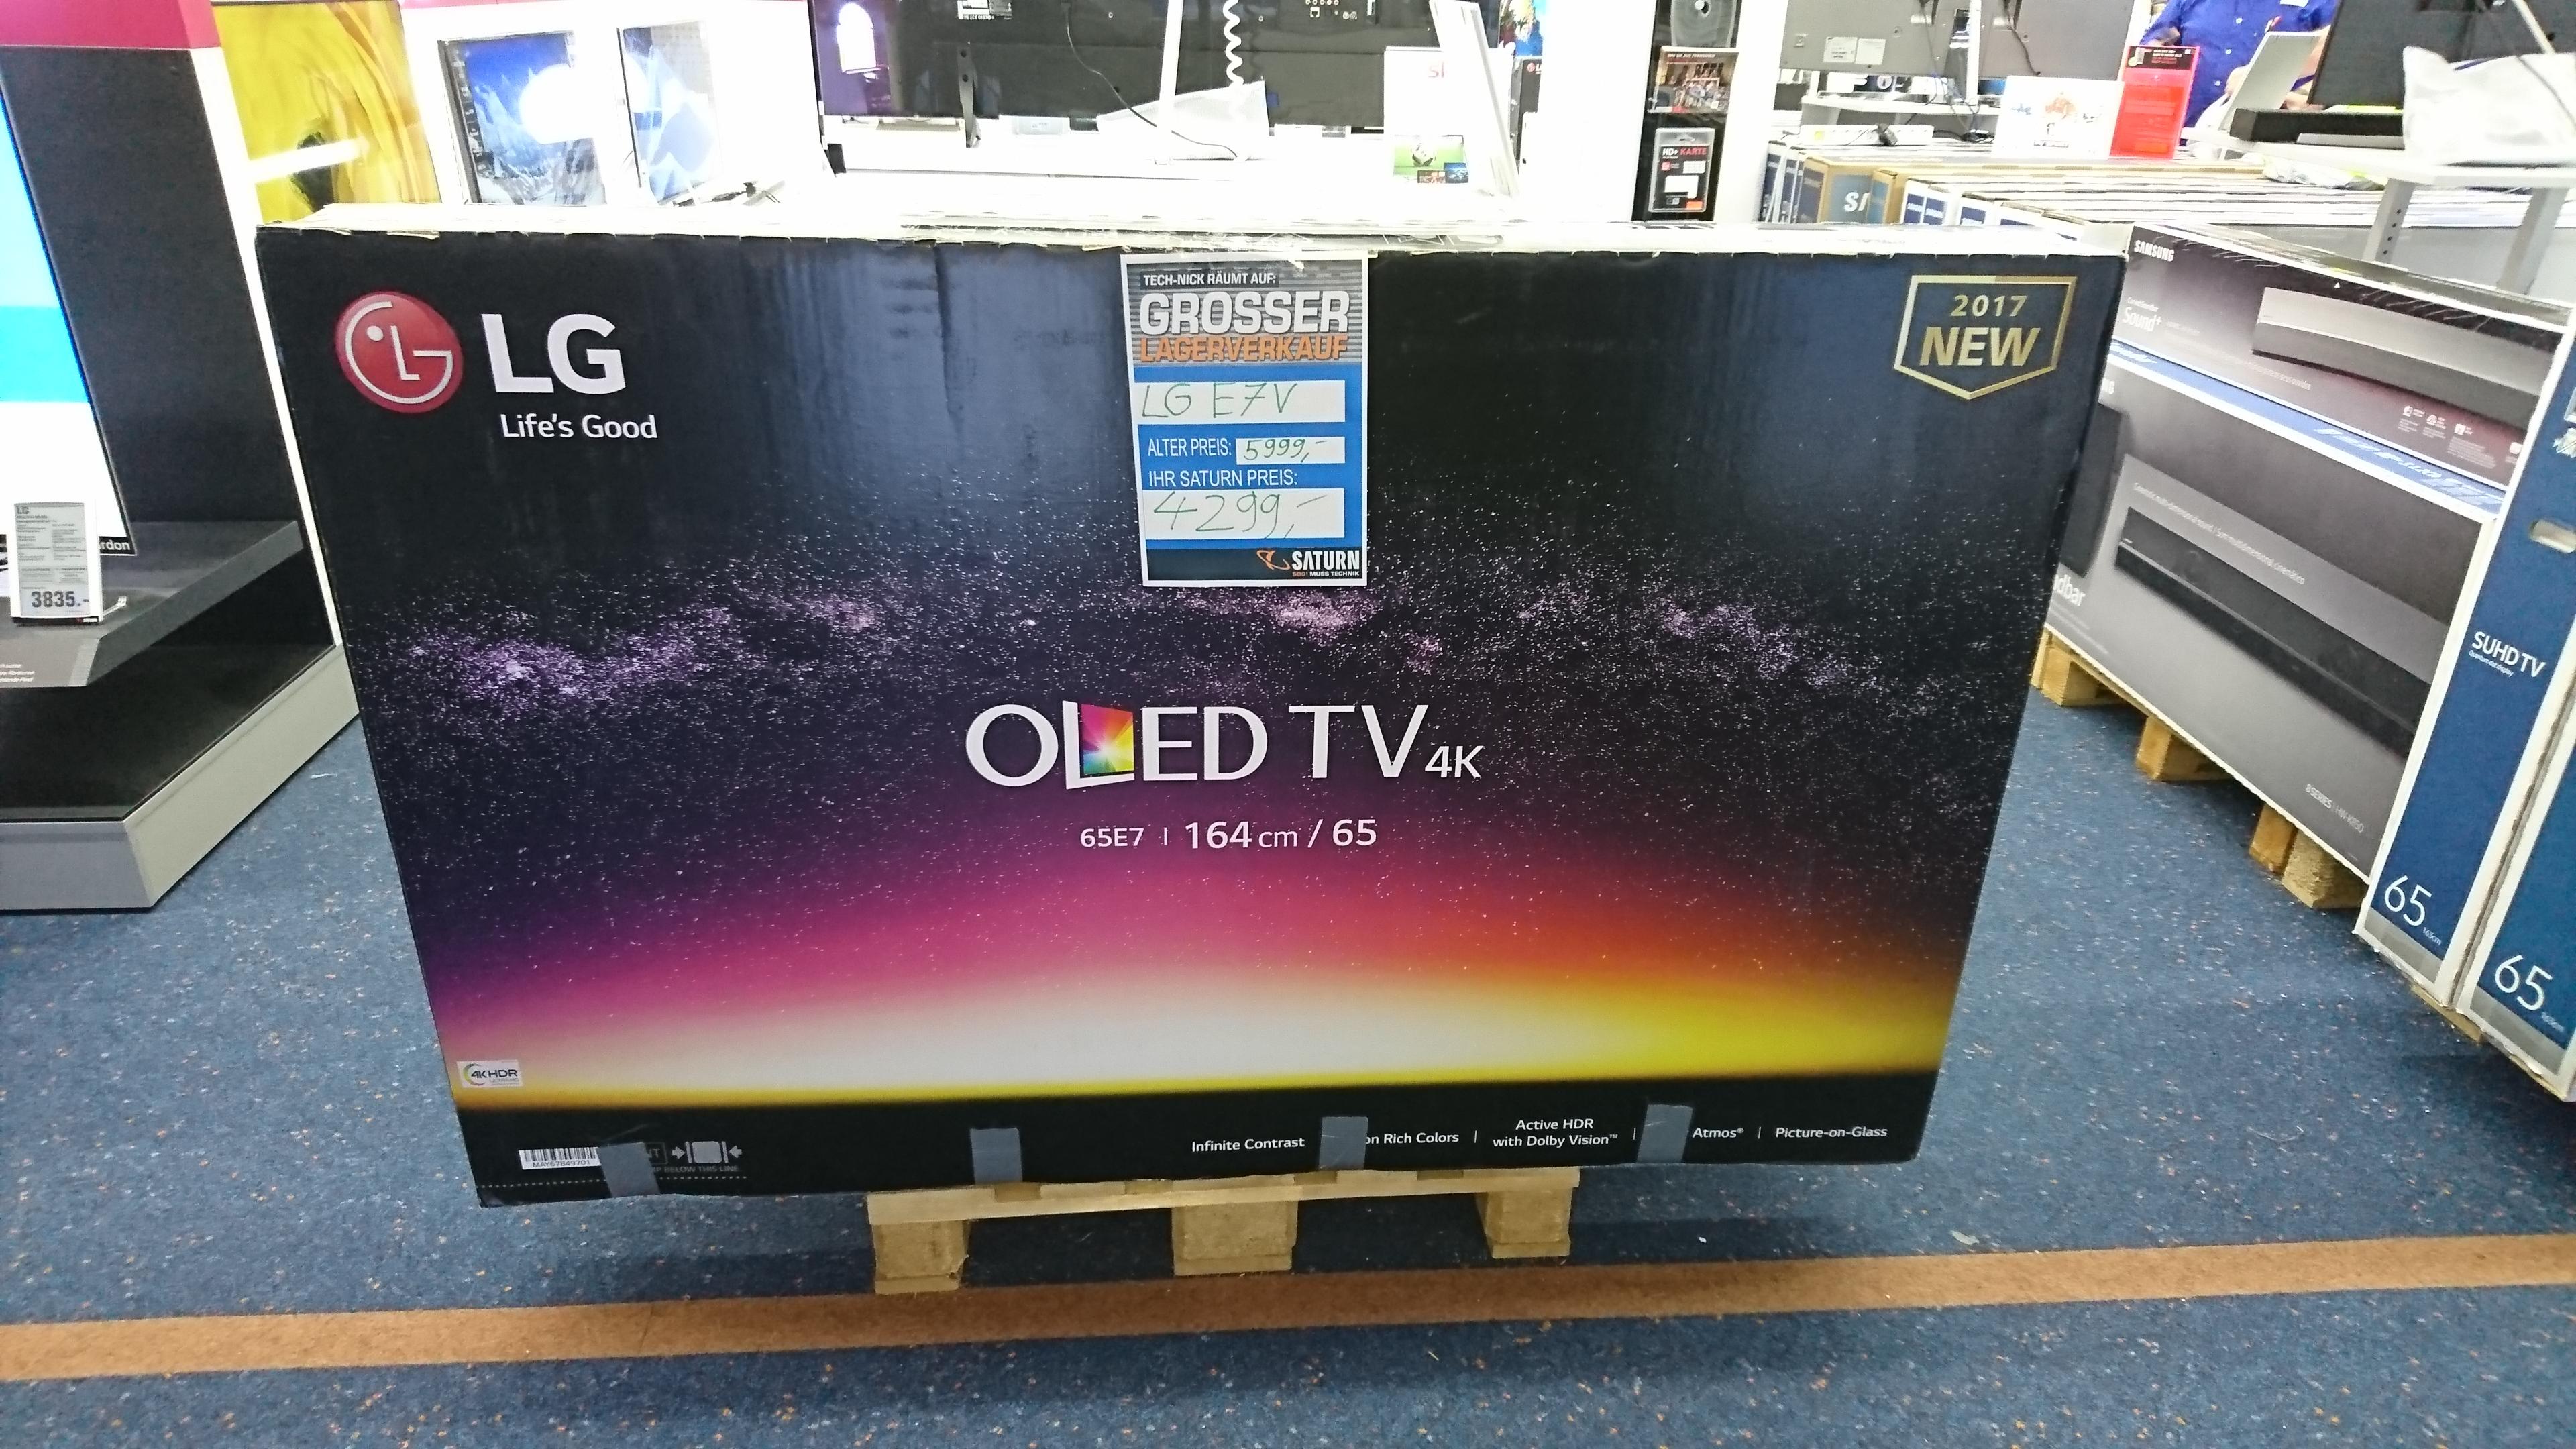 LG E7V (4K OLED TV) - Lokal - Saturn in Bergisch Gladbach